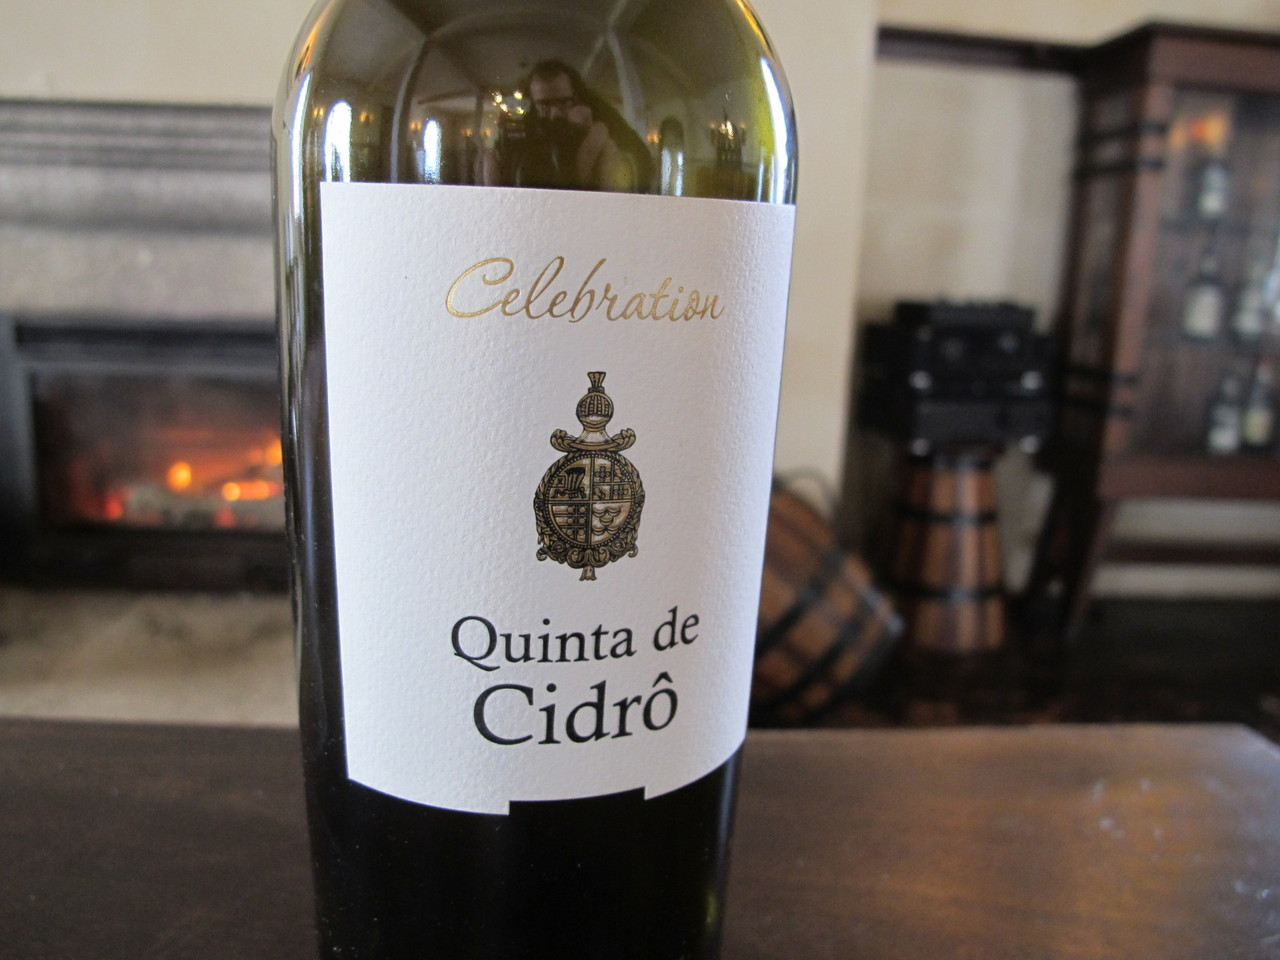 Quinta de Cidrô Celebration